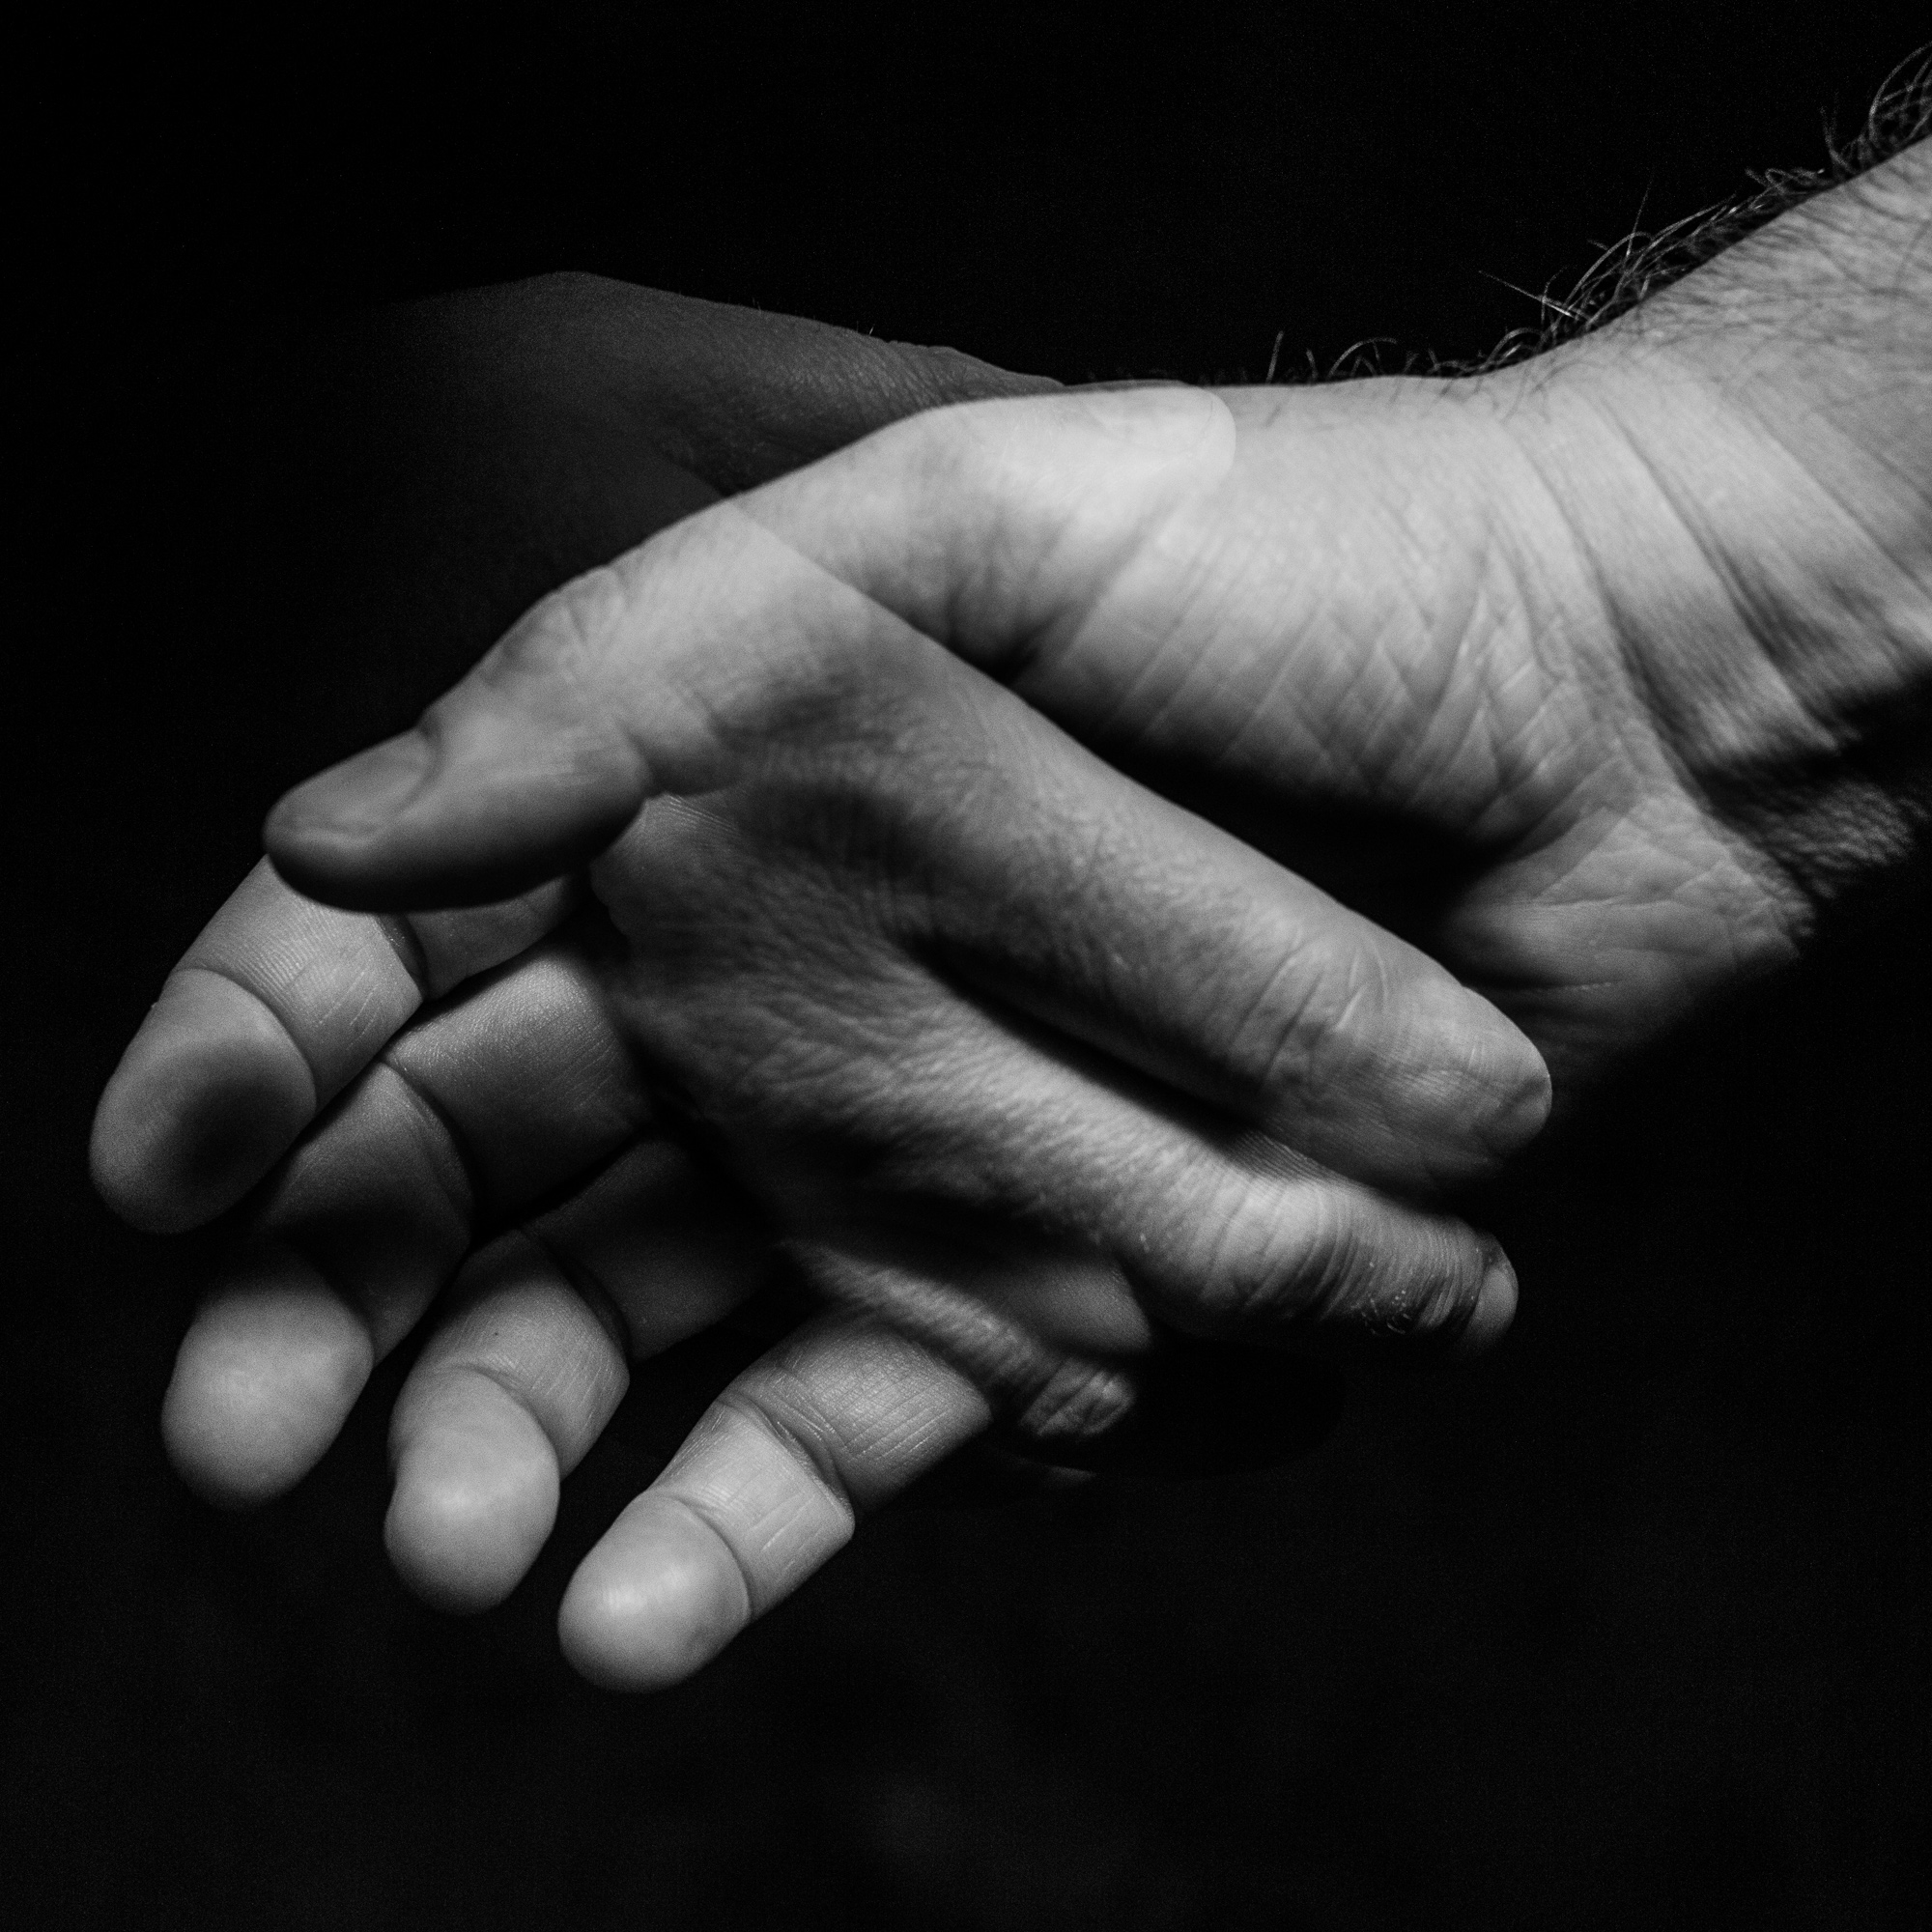 Hand30-117.jpg